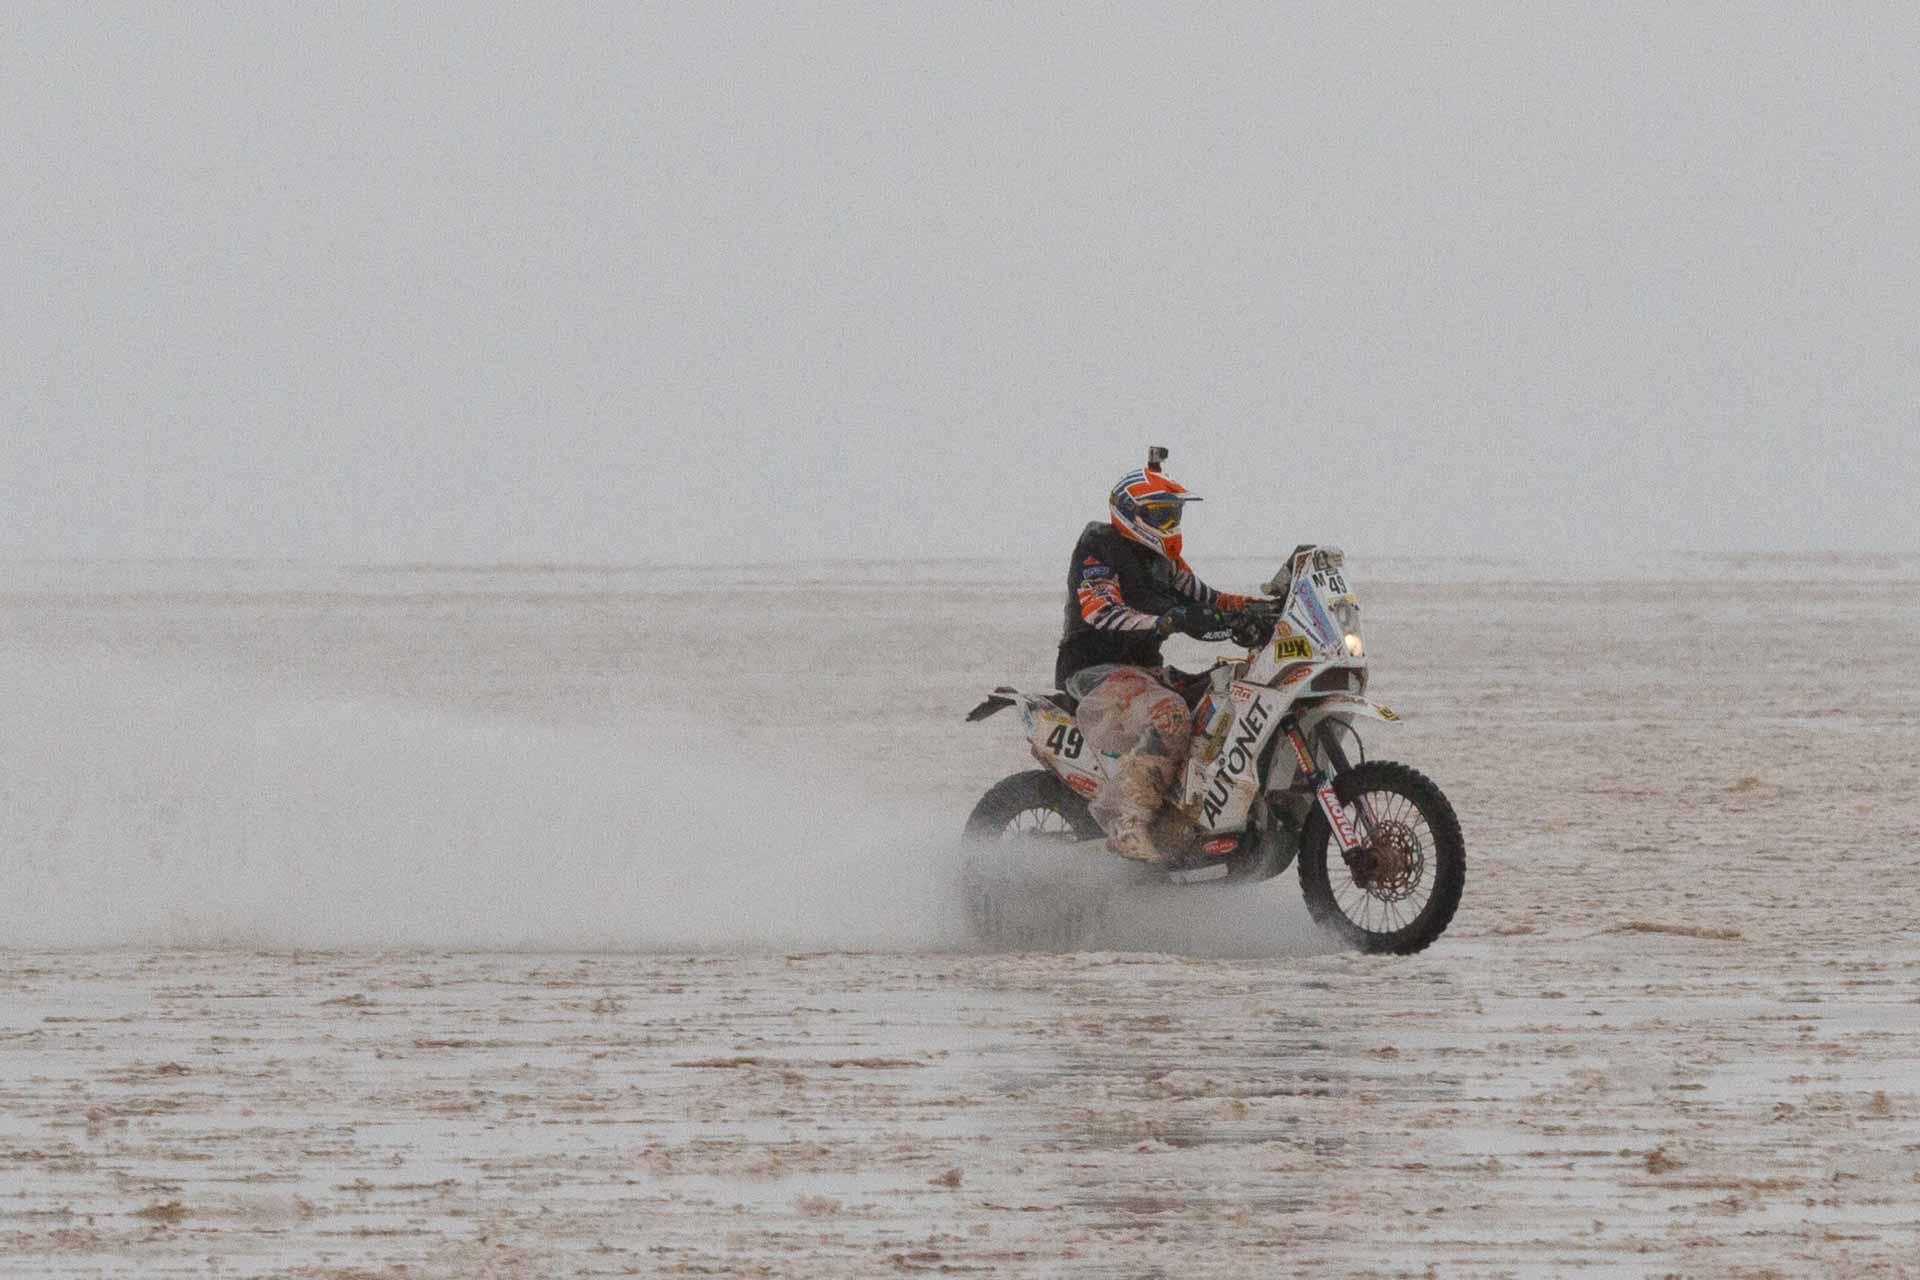 Dakar 2015: Gyenes revine in Argentina pe locul 24 la general